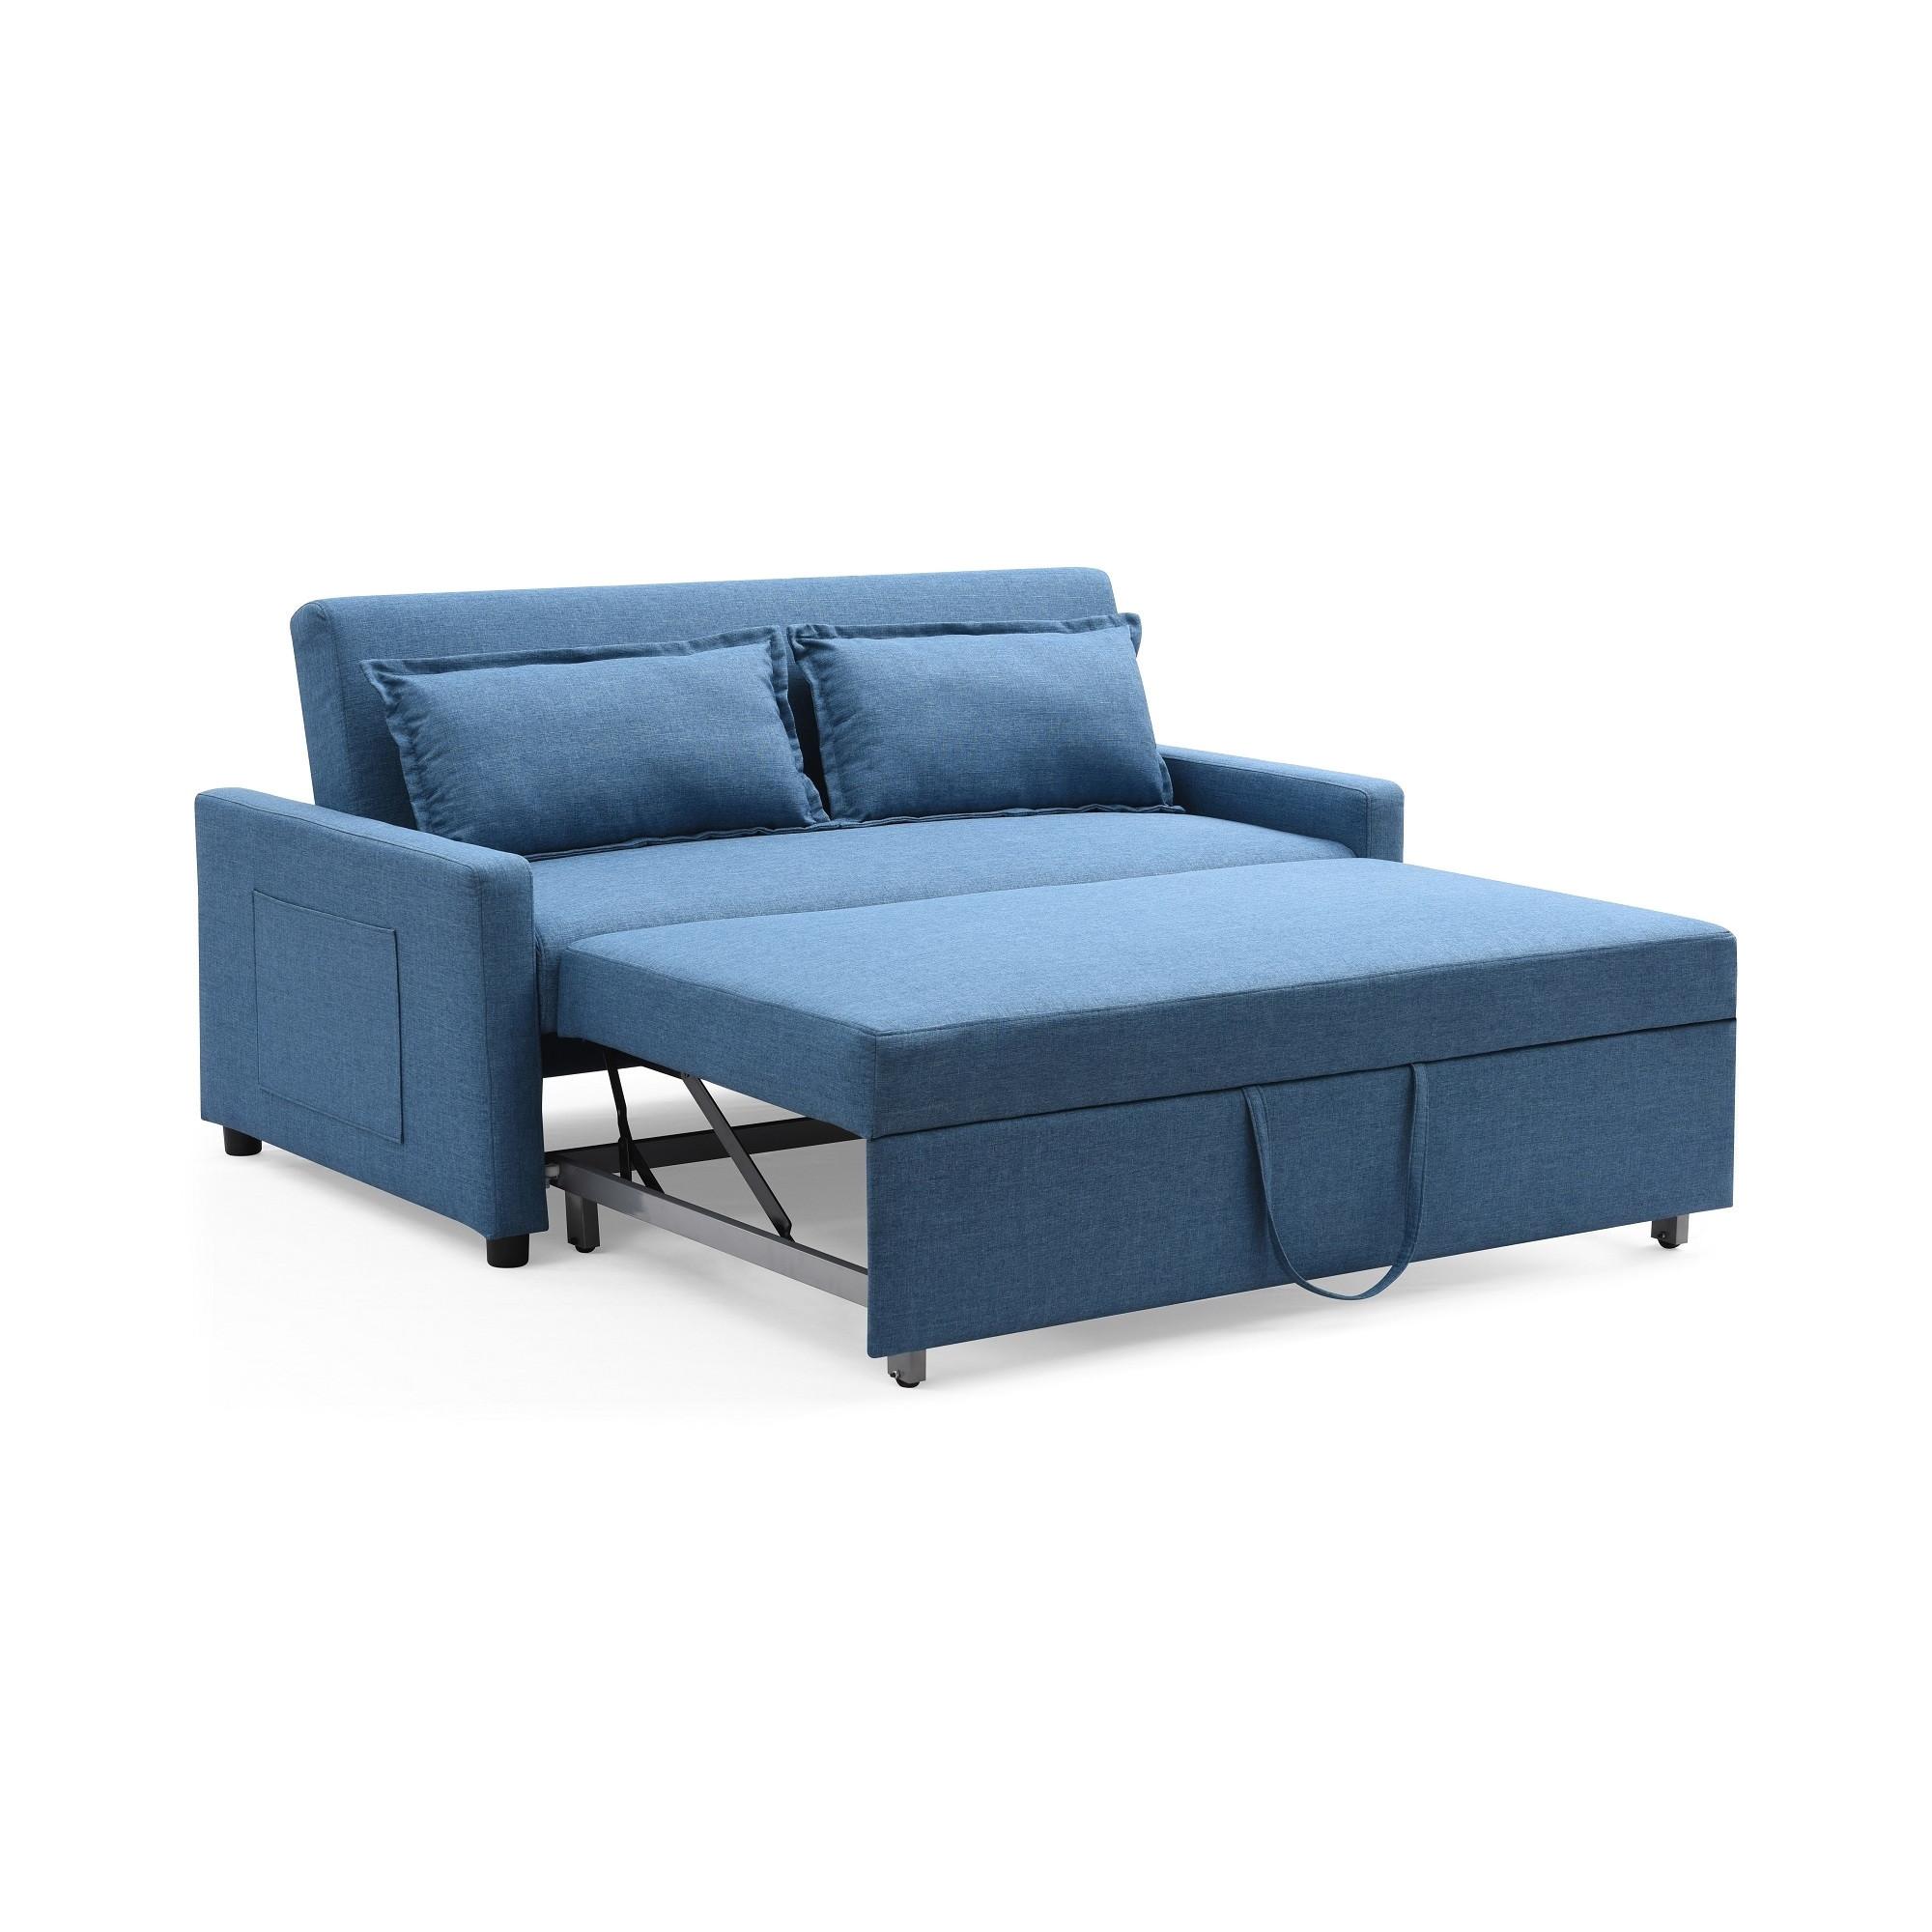 ecksofa ikea elegant futon new leather futon sofa fresh luxurios wicker outdoor sofa 0d